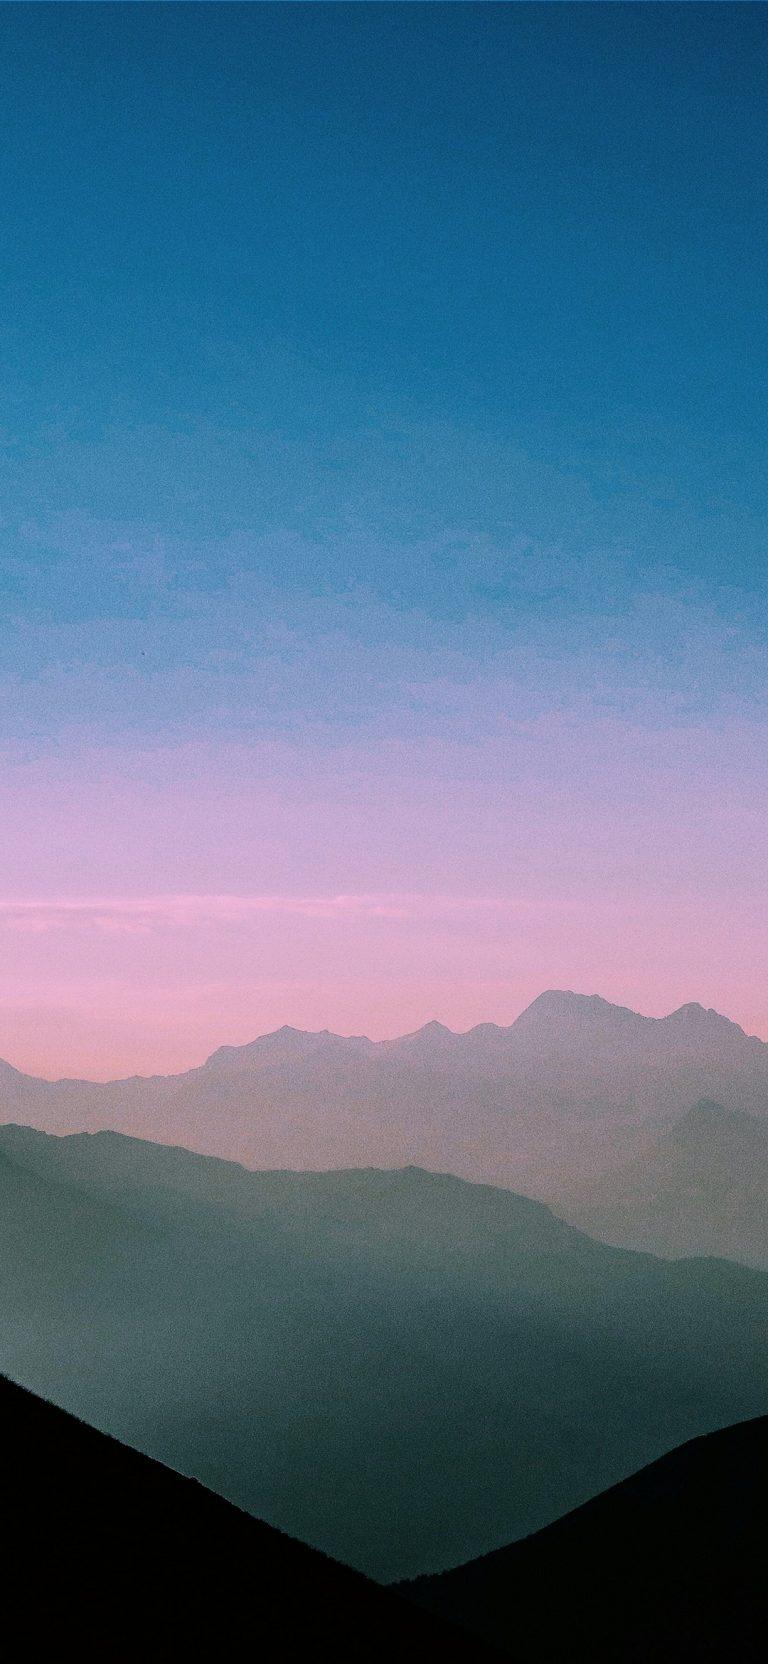 Landscape Phone Wallpaper 115 1080x2340 768x1664